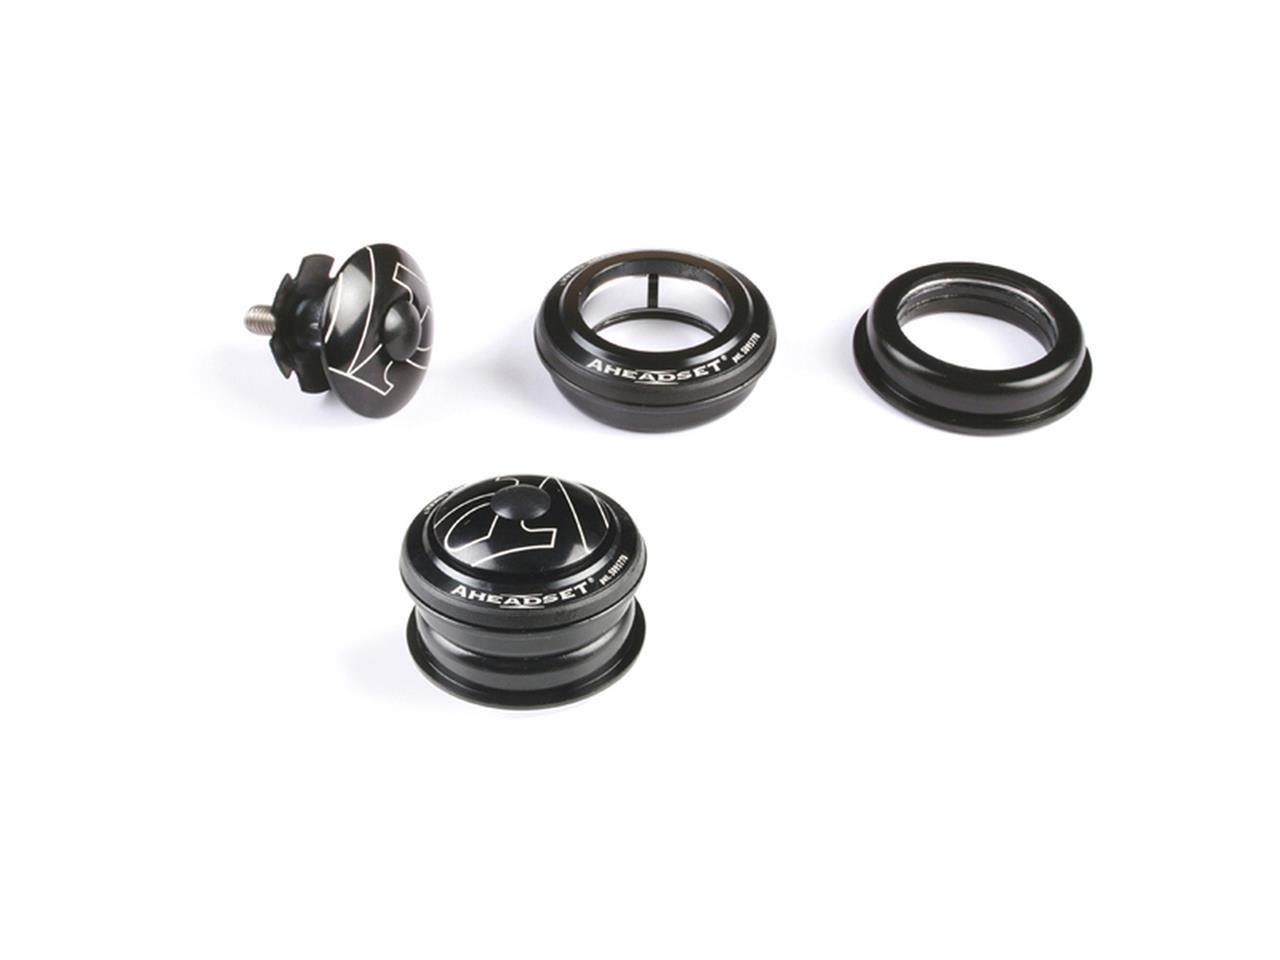 Jeu de direction vélo VP COMPONENTS semi-integré - aluminium noir Ø28,6 x 41,4mm